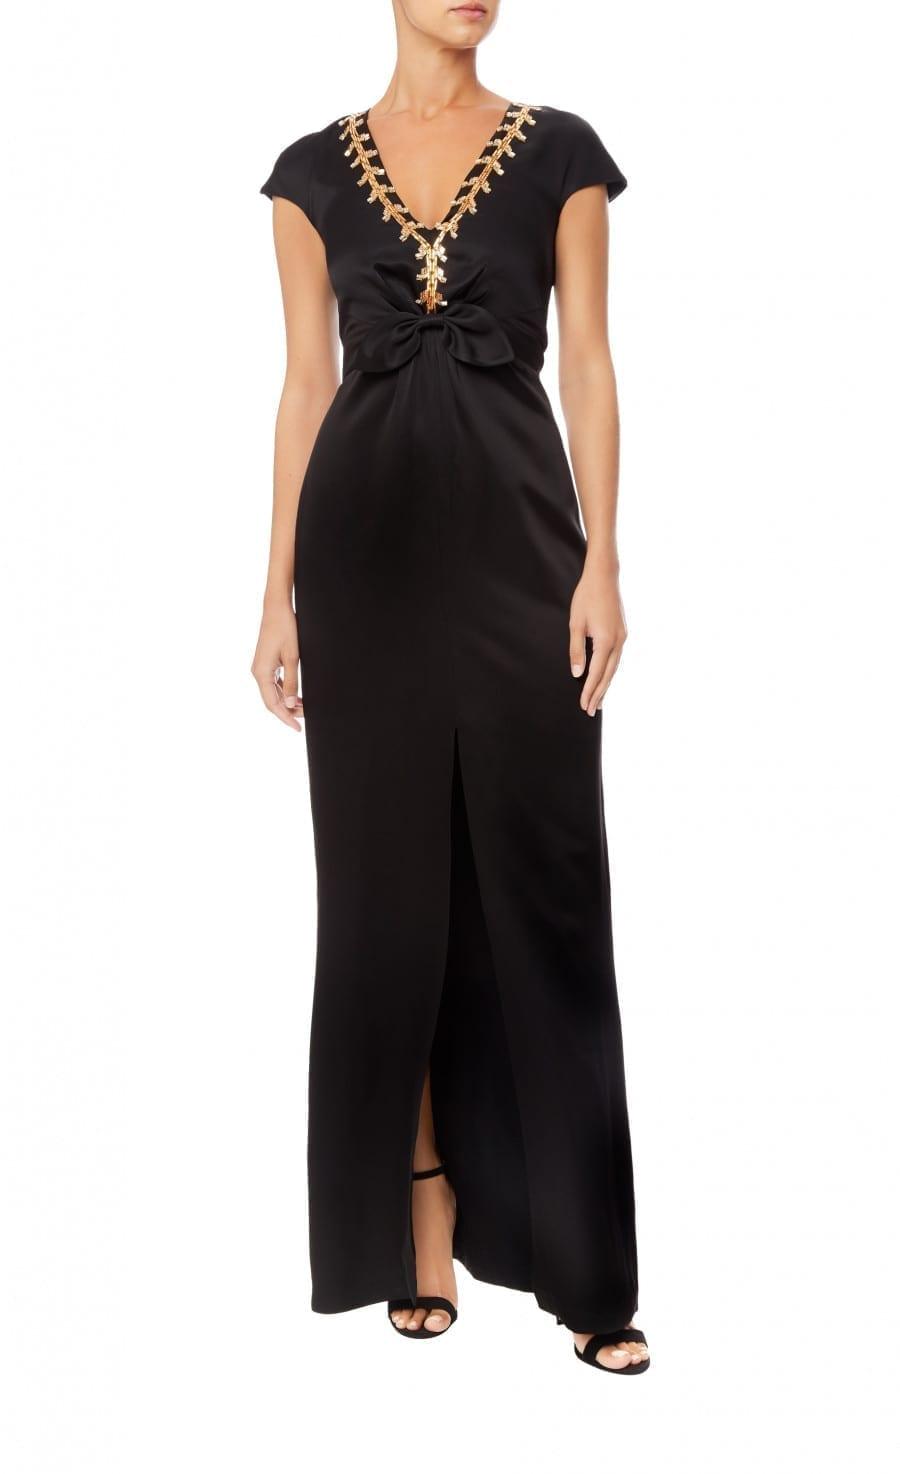 TEMPERLEY LONDON Nile Tie Black Dress